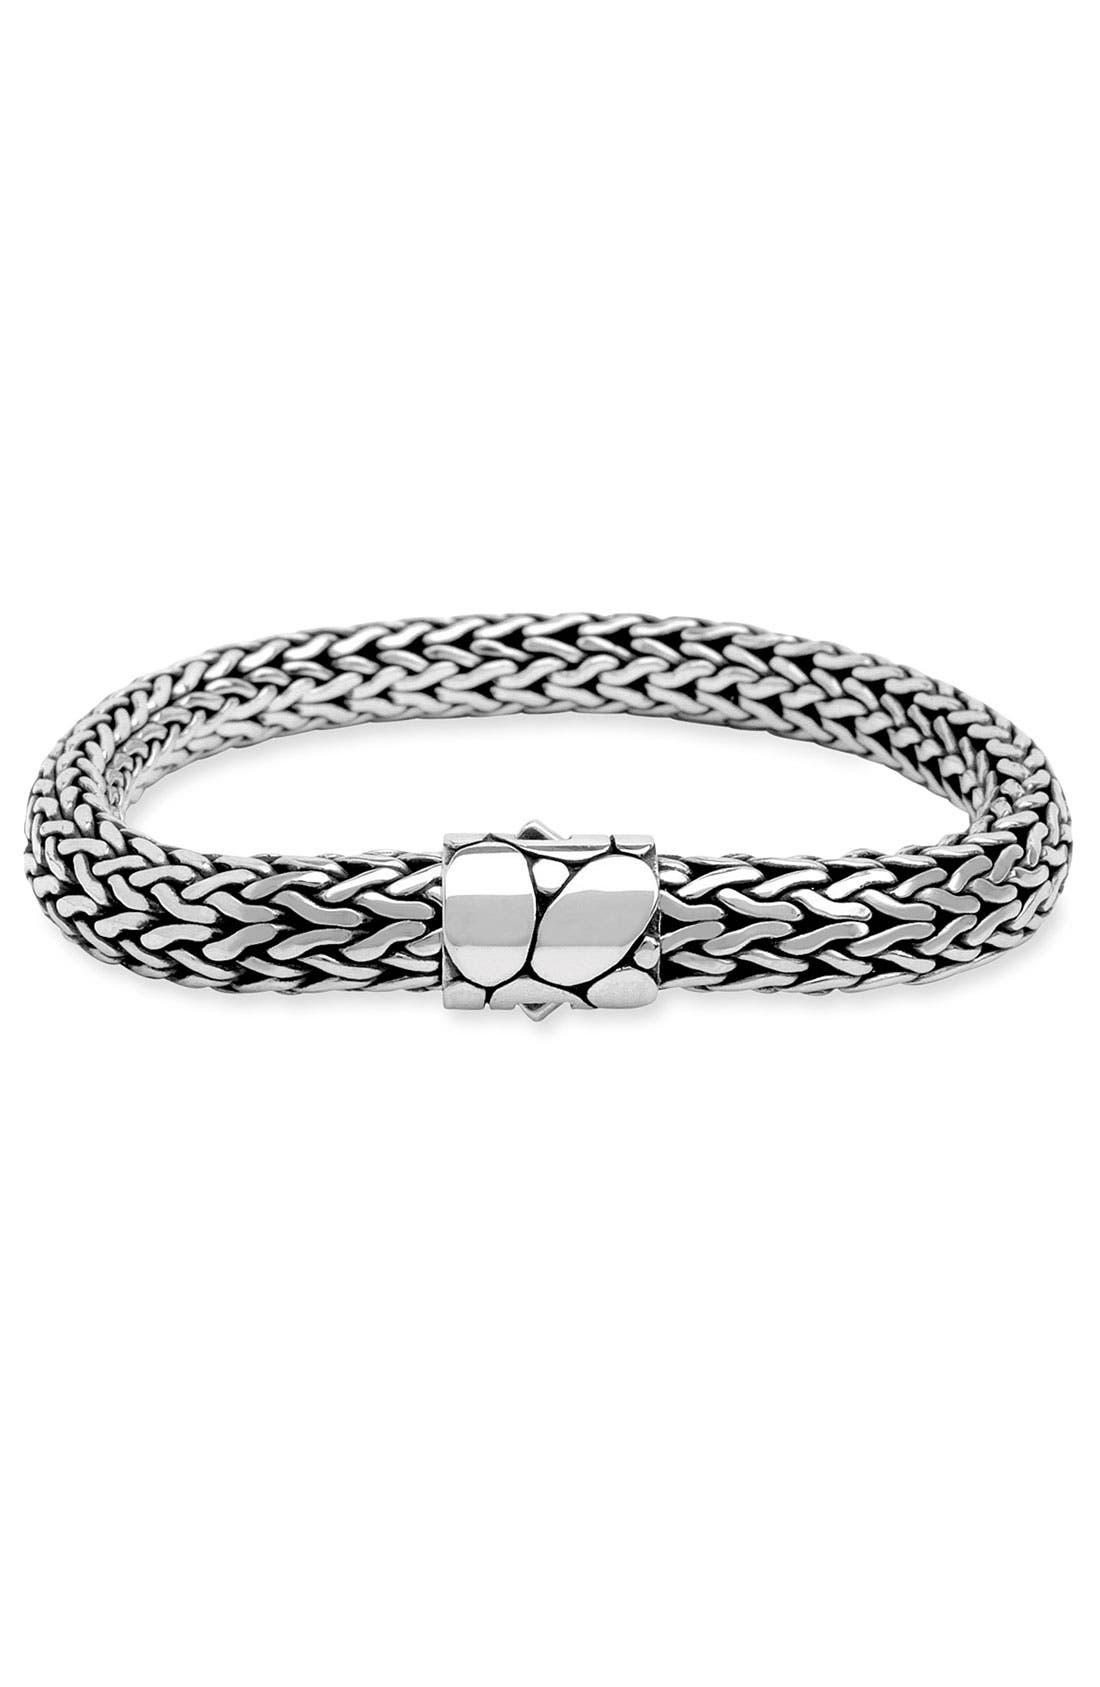 Main Image - John Hardy 'Kali' Sterling Silver Bracelet